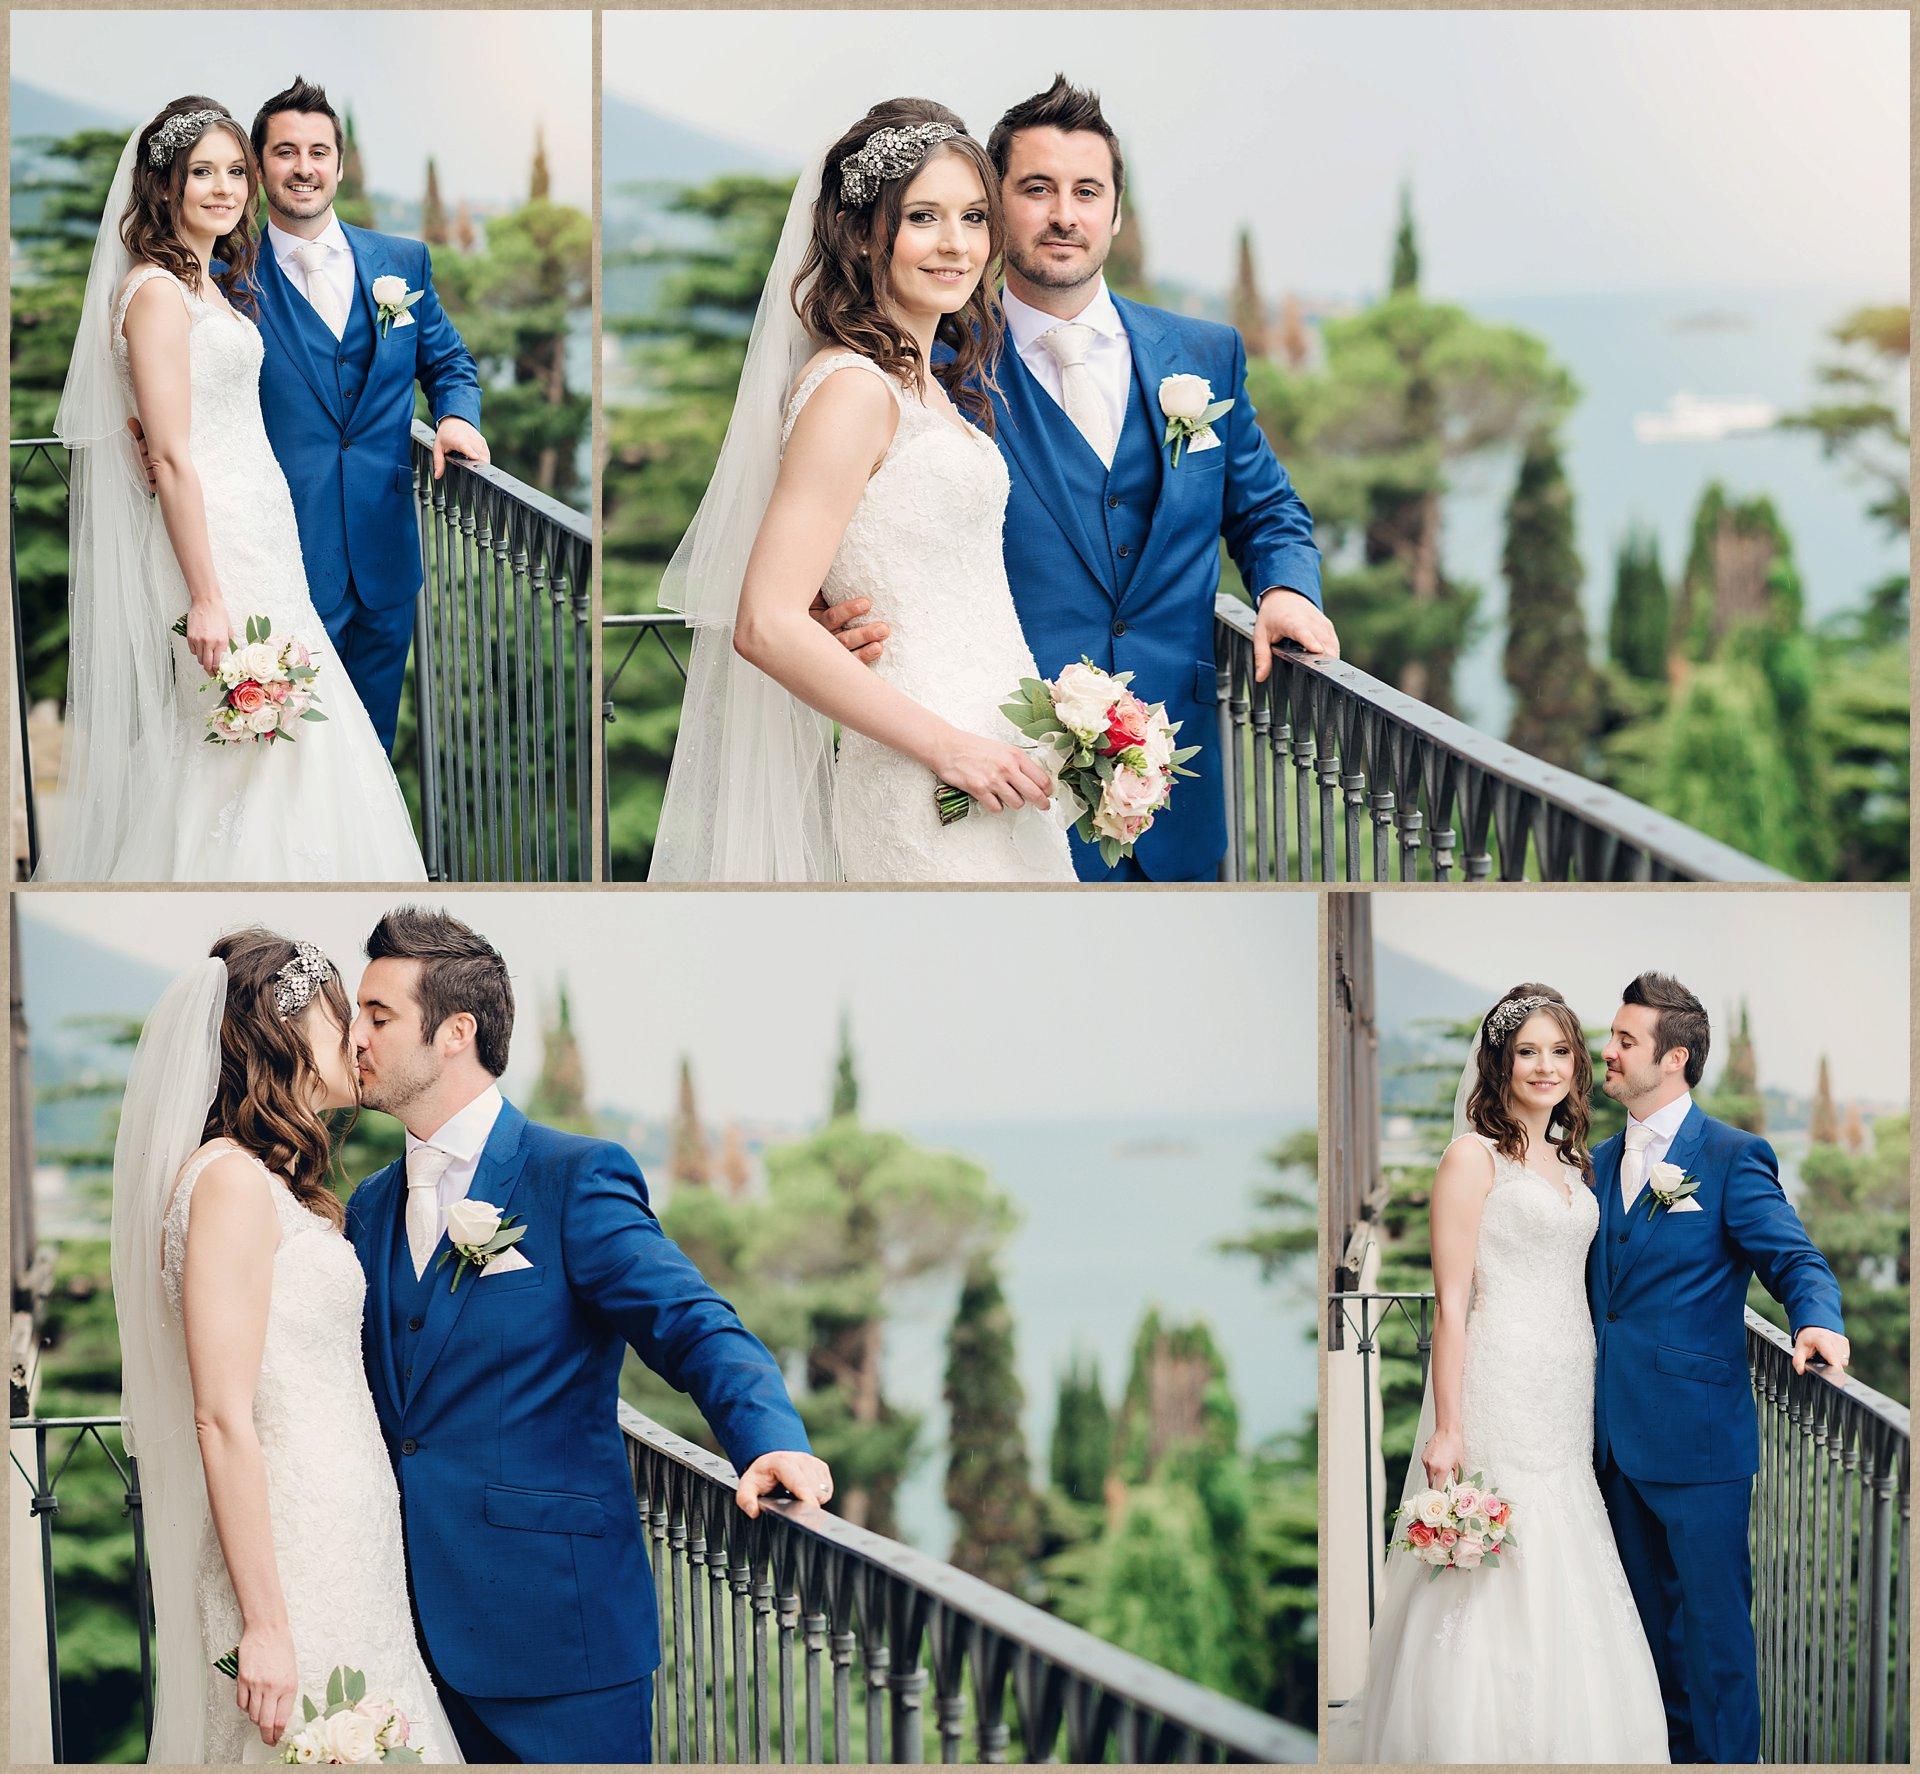 Malcesine Castle wedding balcony - photographer